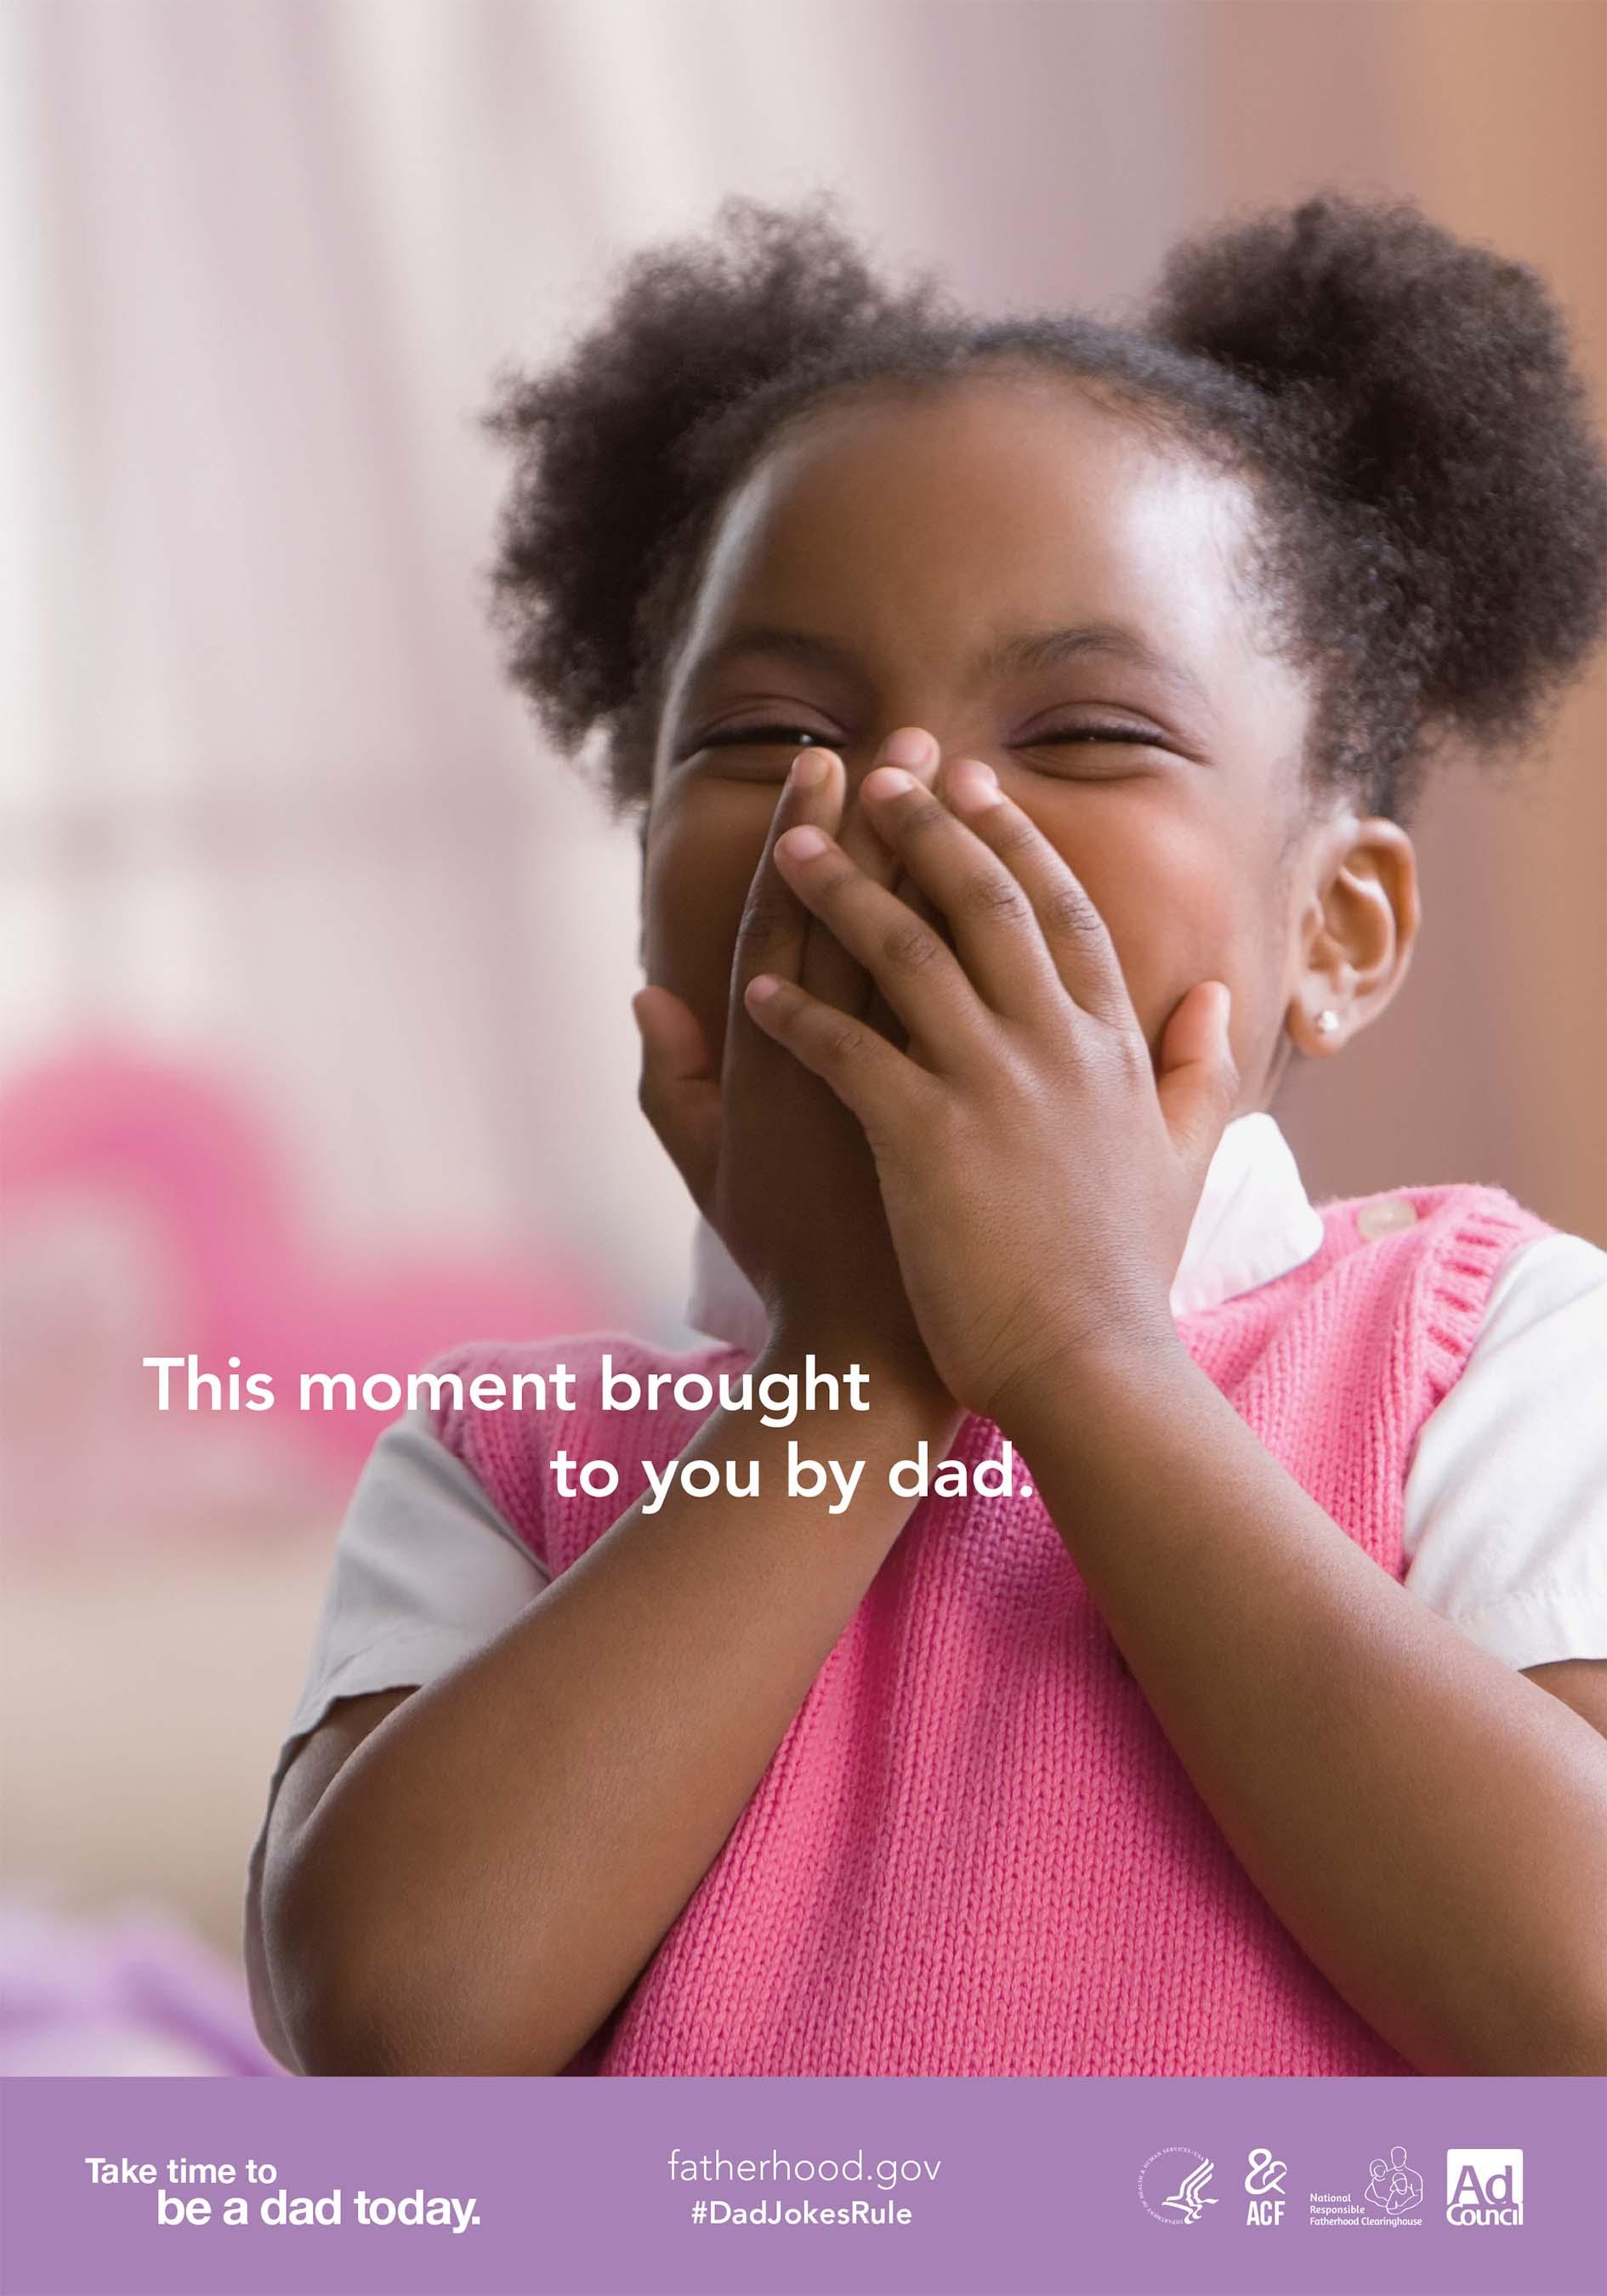 Fatherhood Ad Campaign Uses Cherished